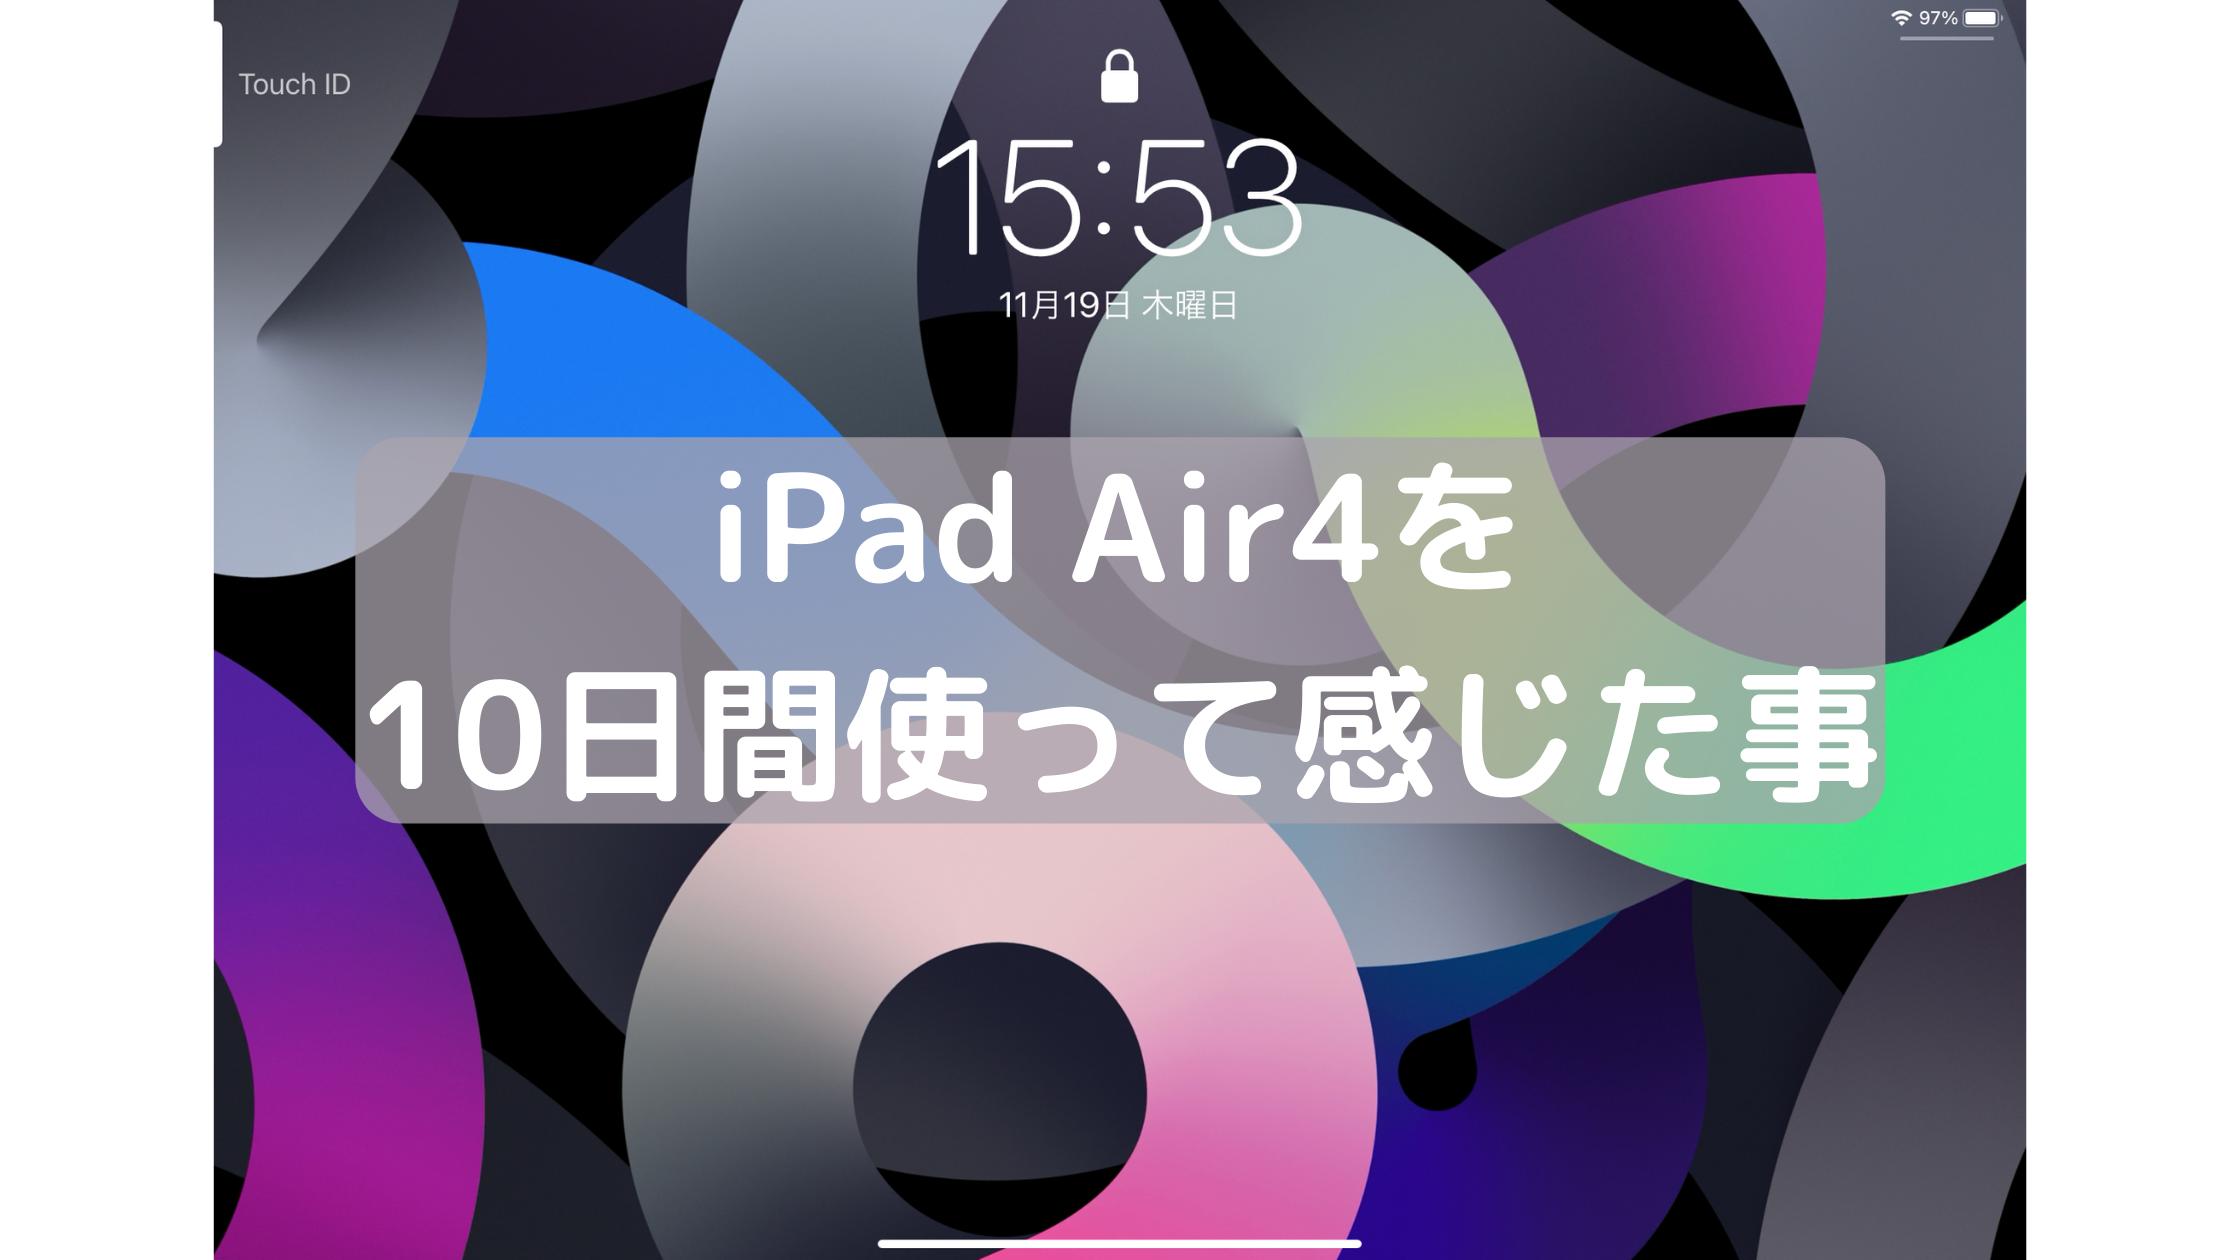 iPad Air4レビュー10日間使って感じた事